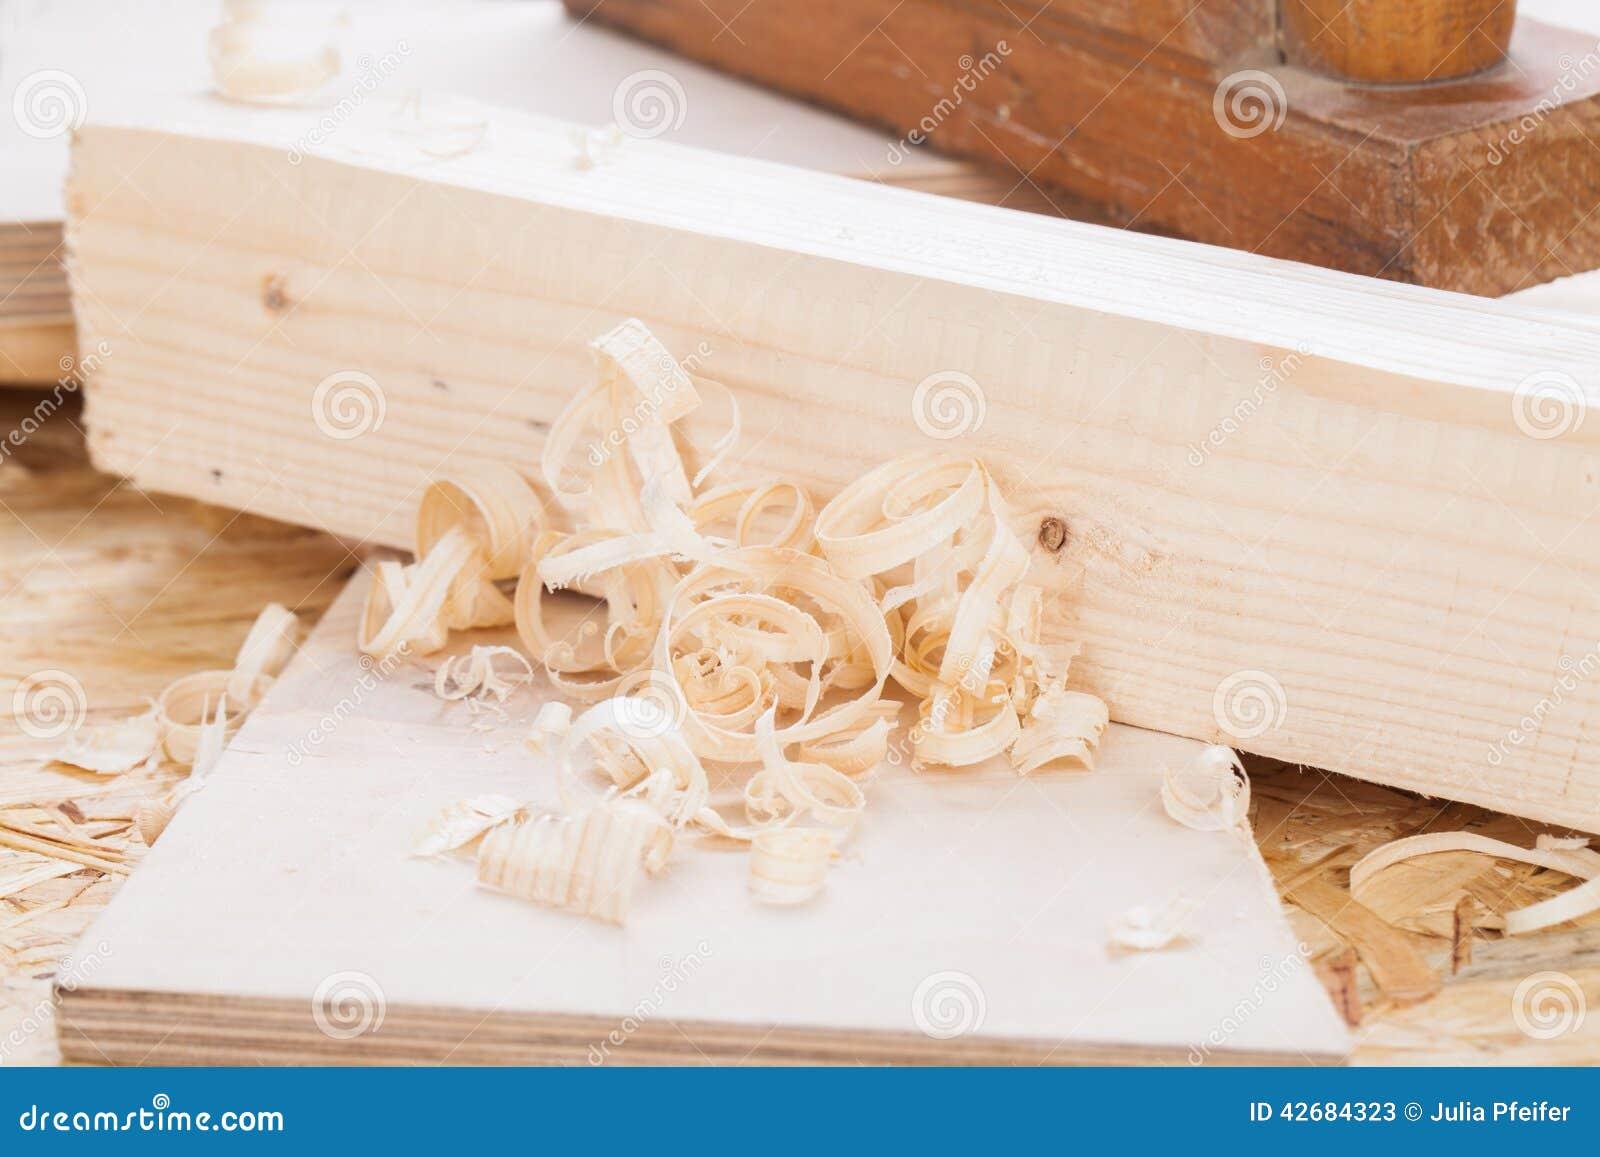 Diy Plank Hobby Craft